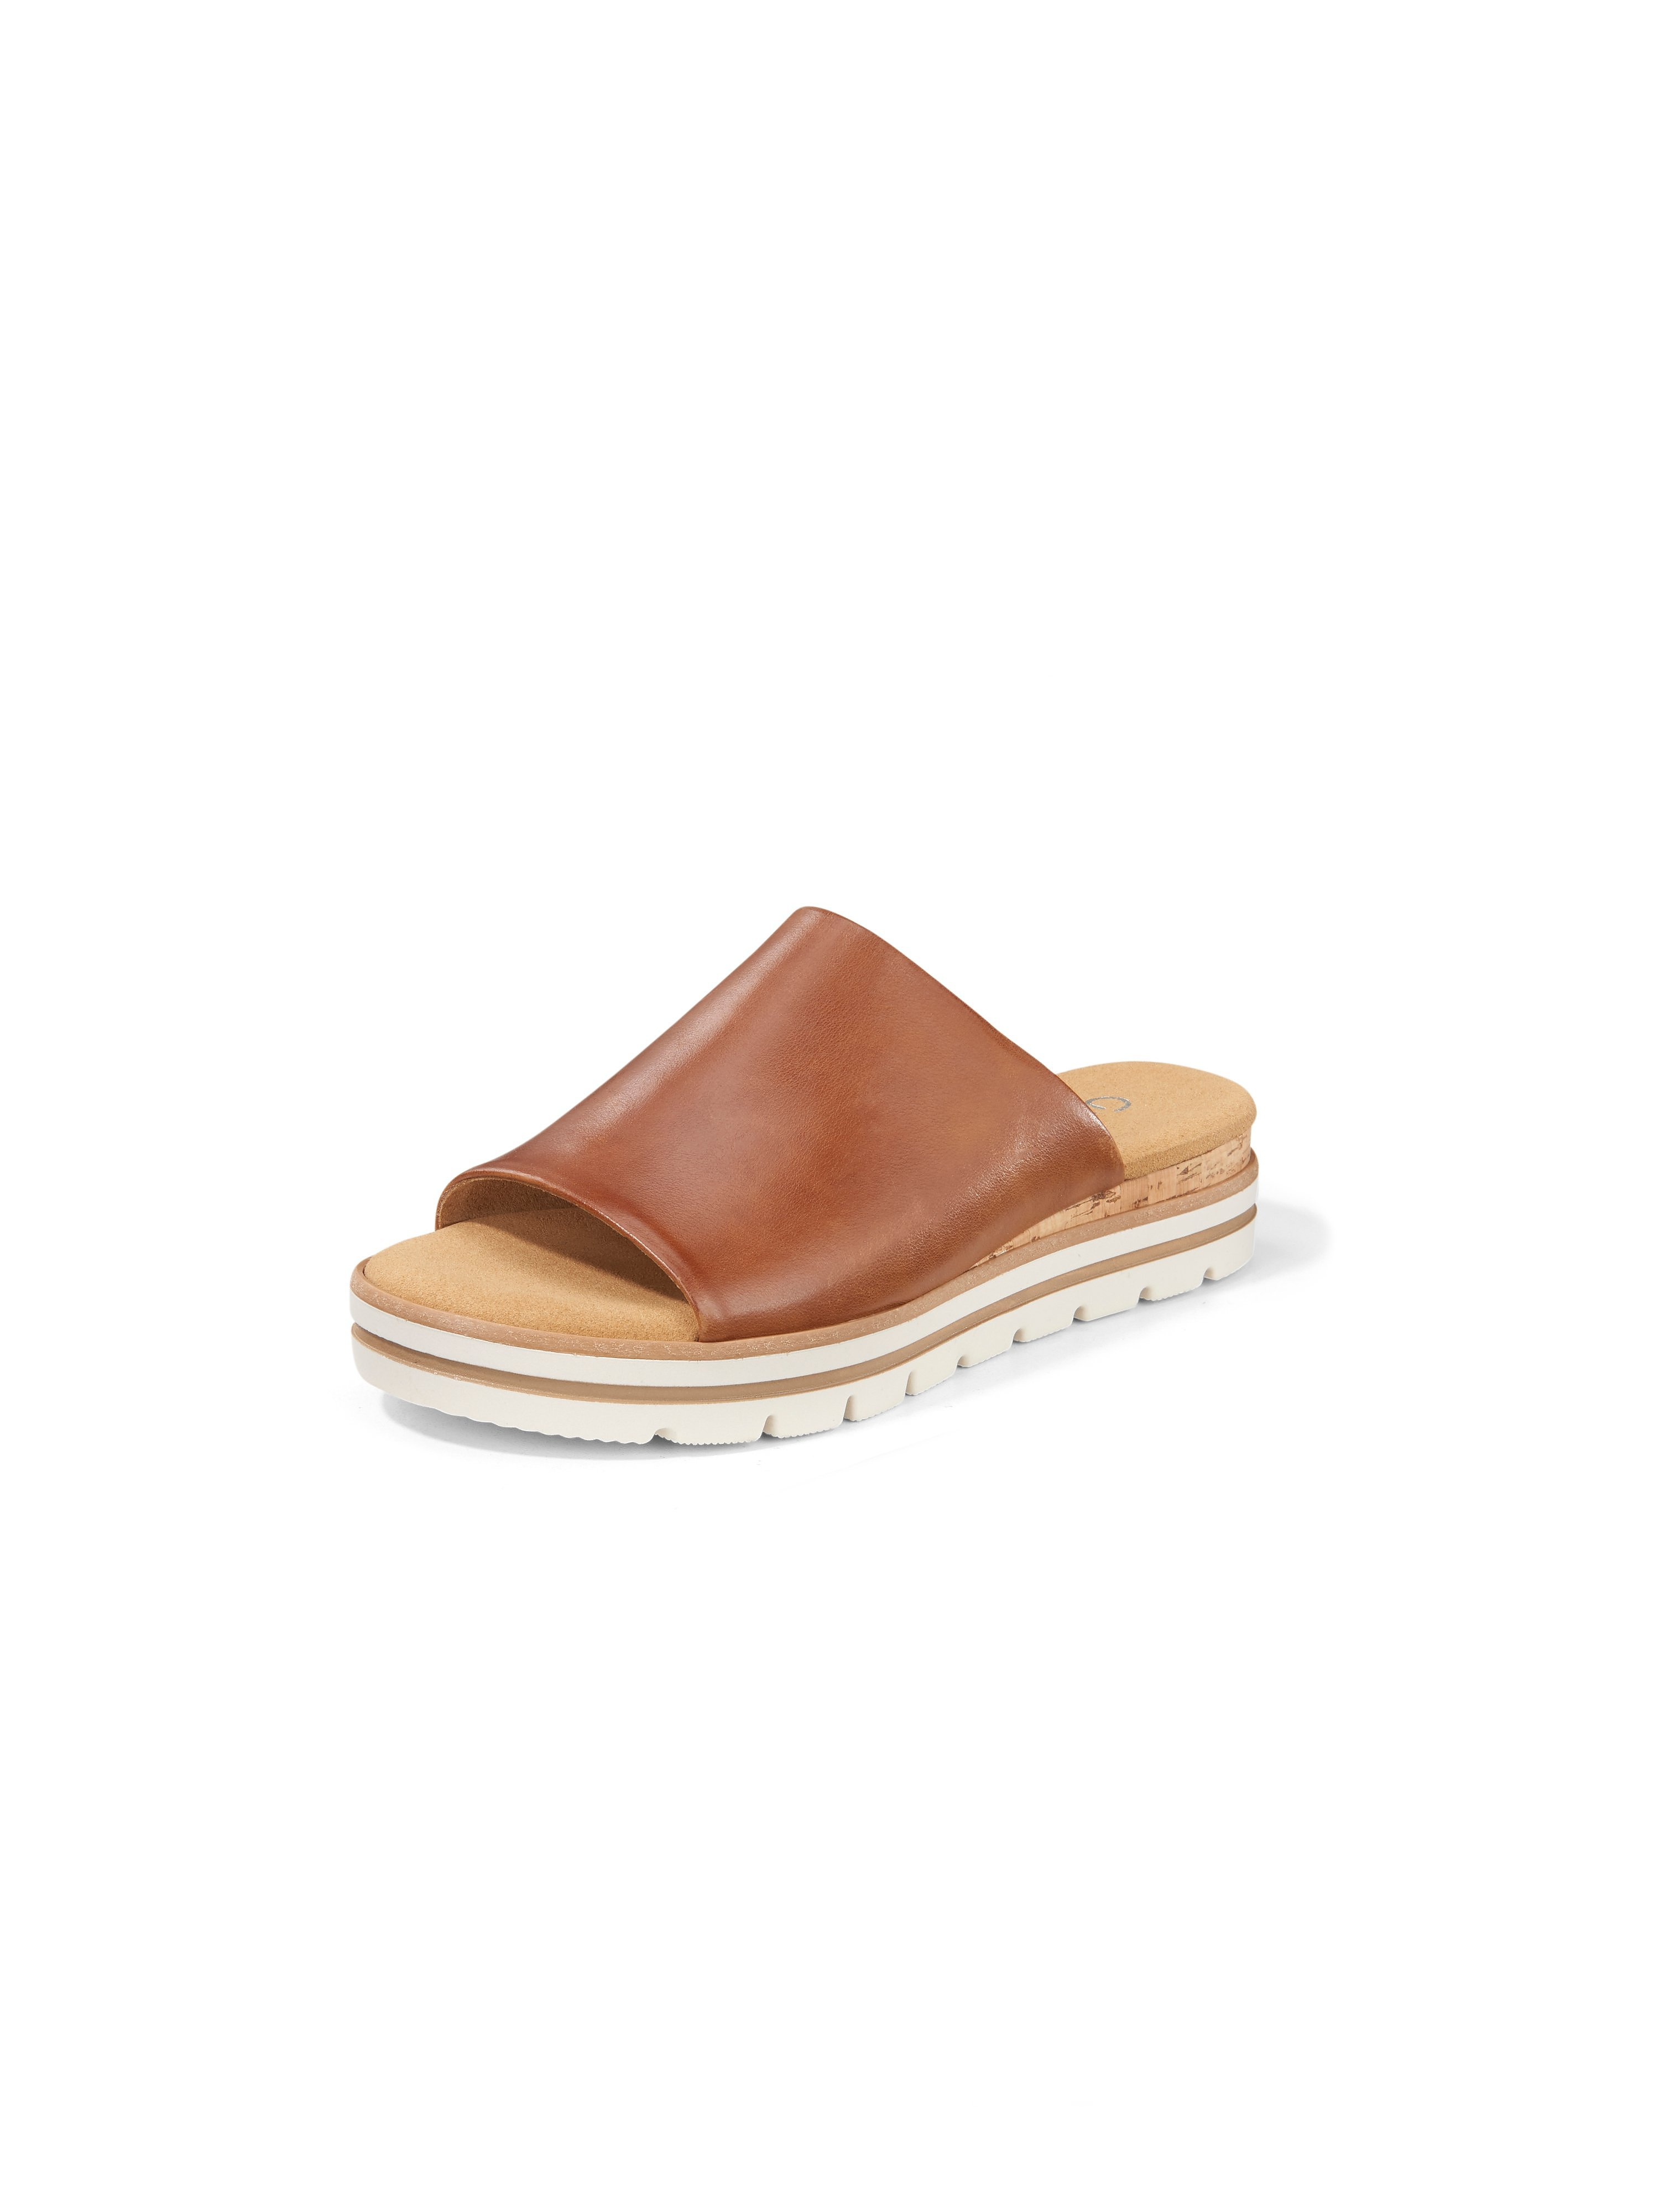 Calf nappa leather platform sandals Gabor Comfort brown